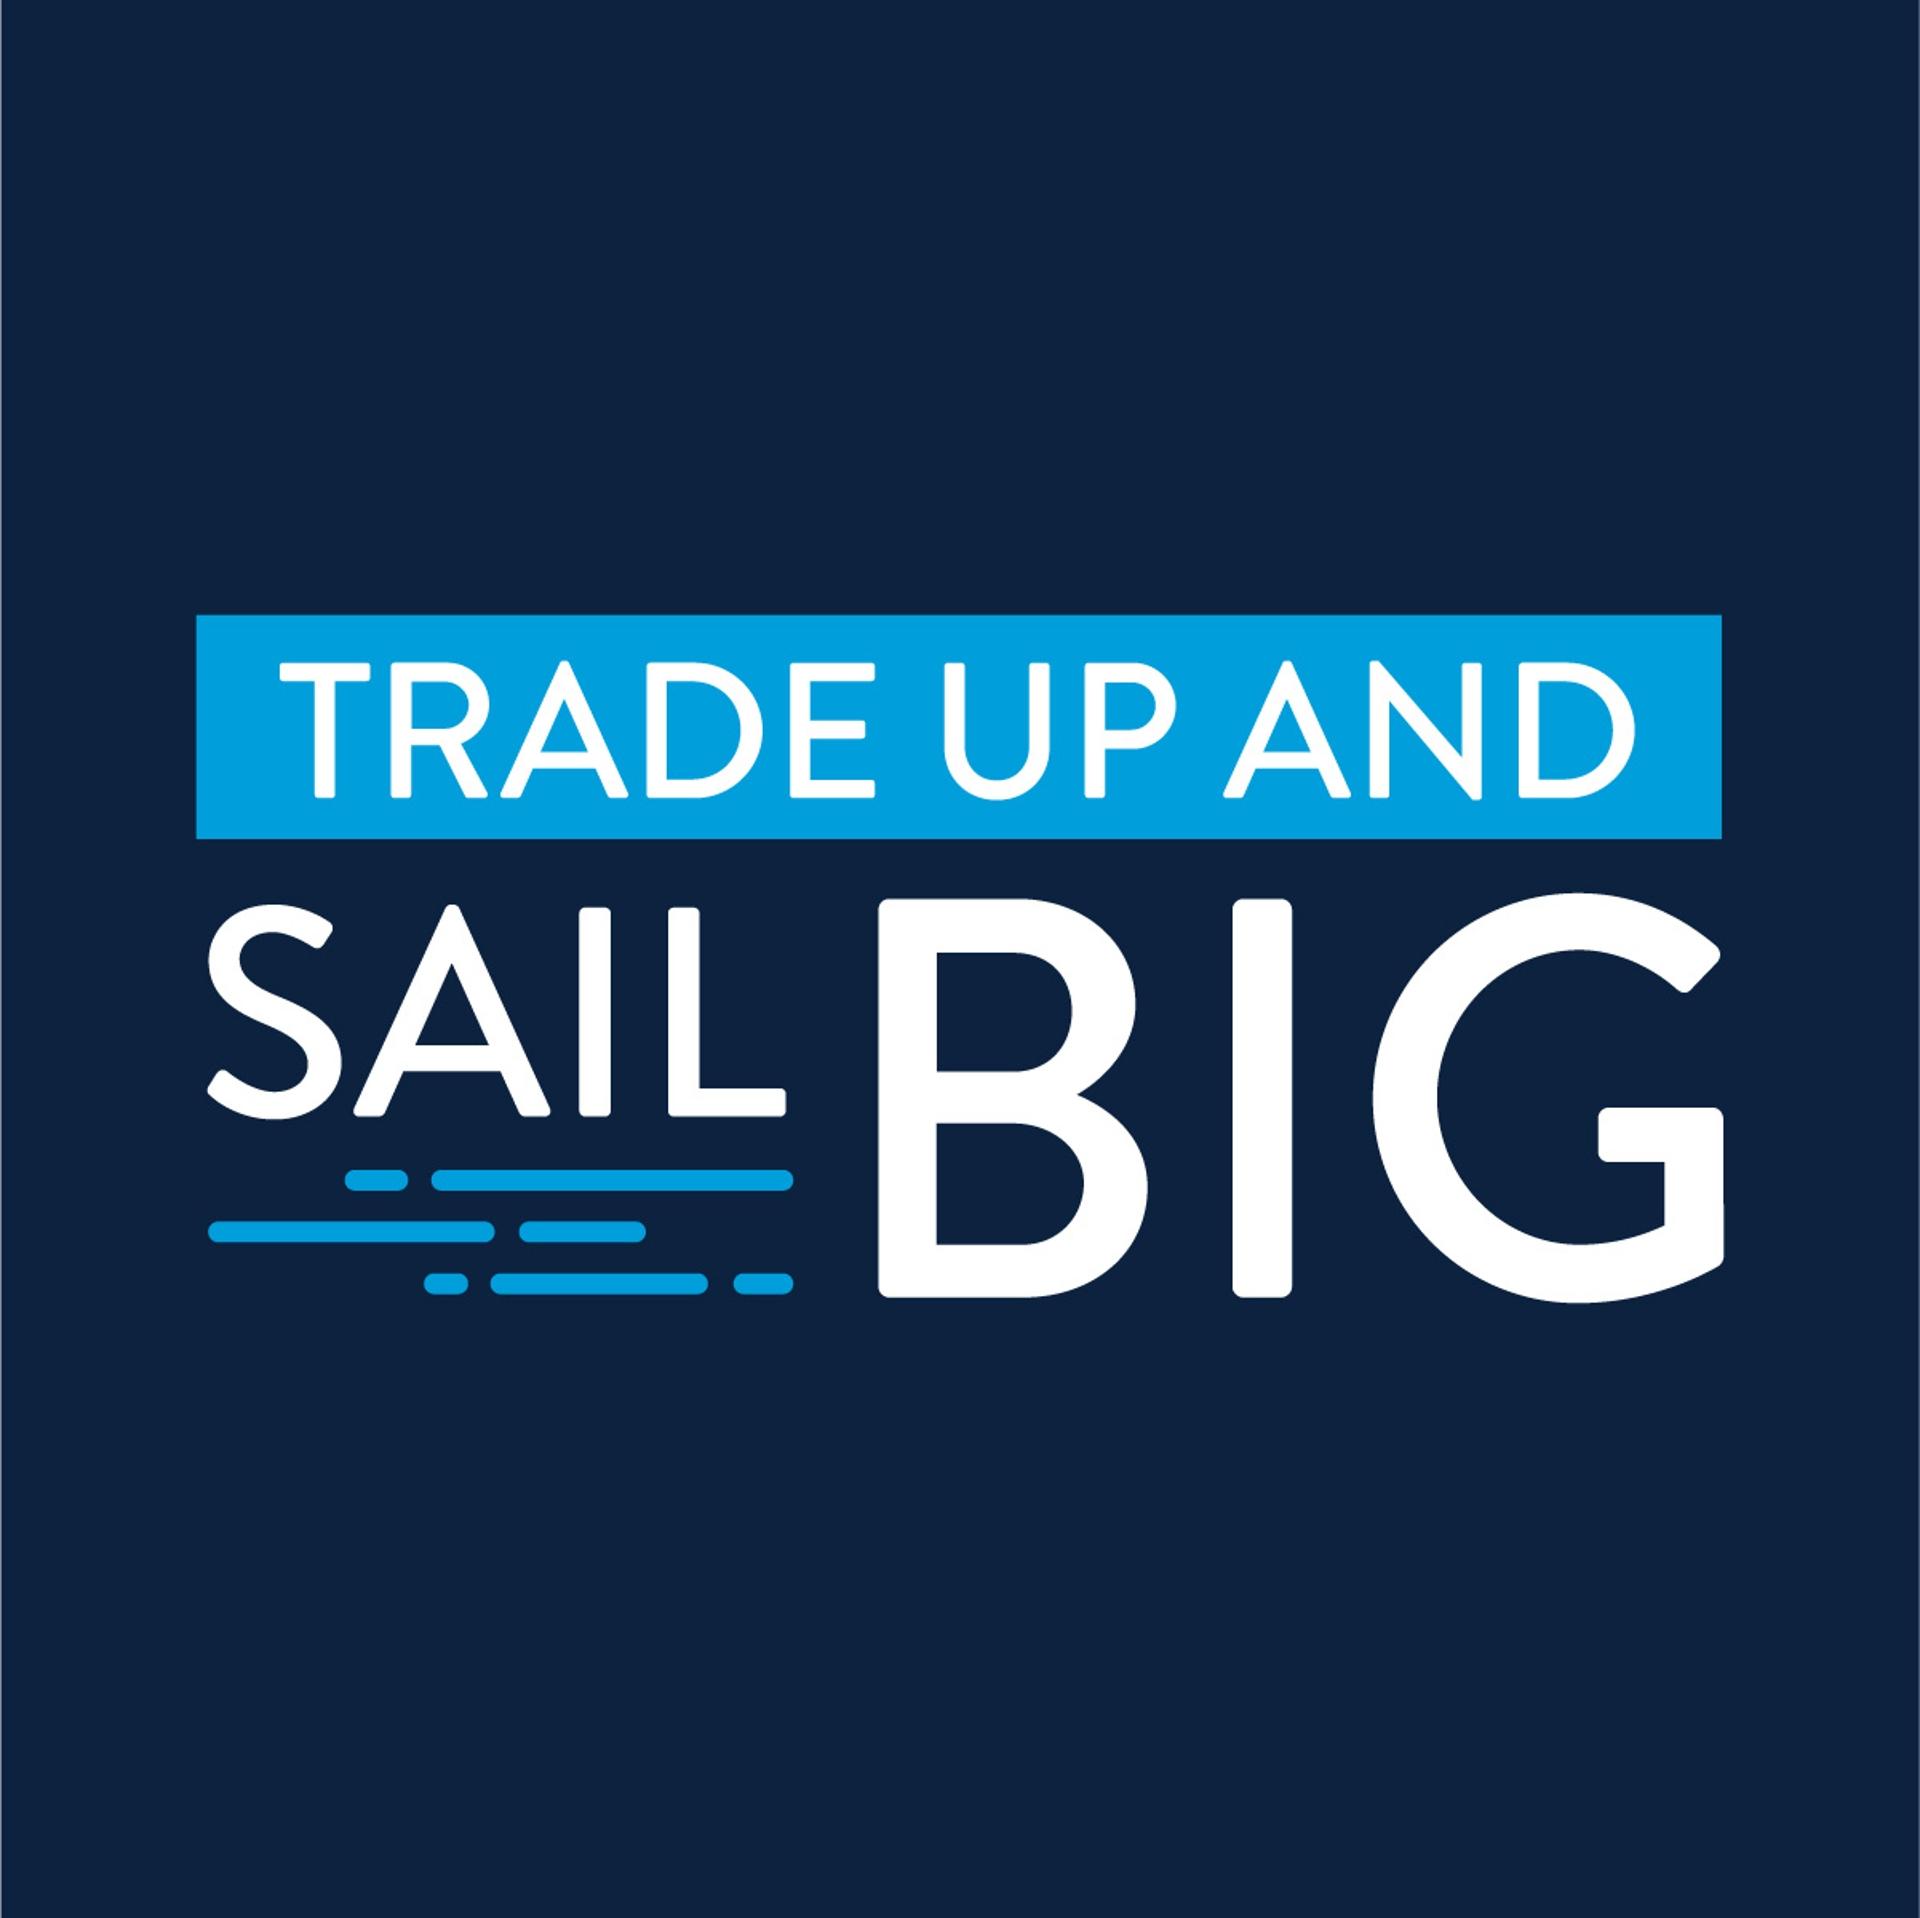 Trade Up and Sail Big Campaign